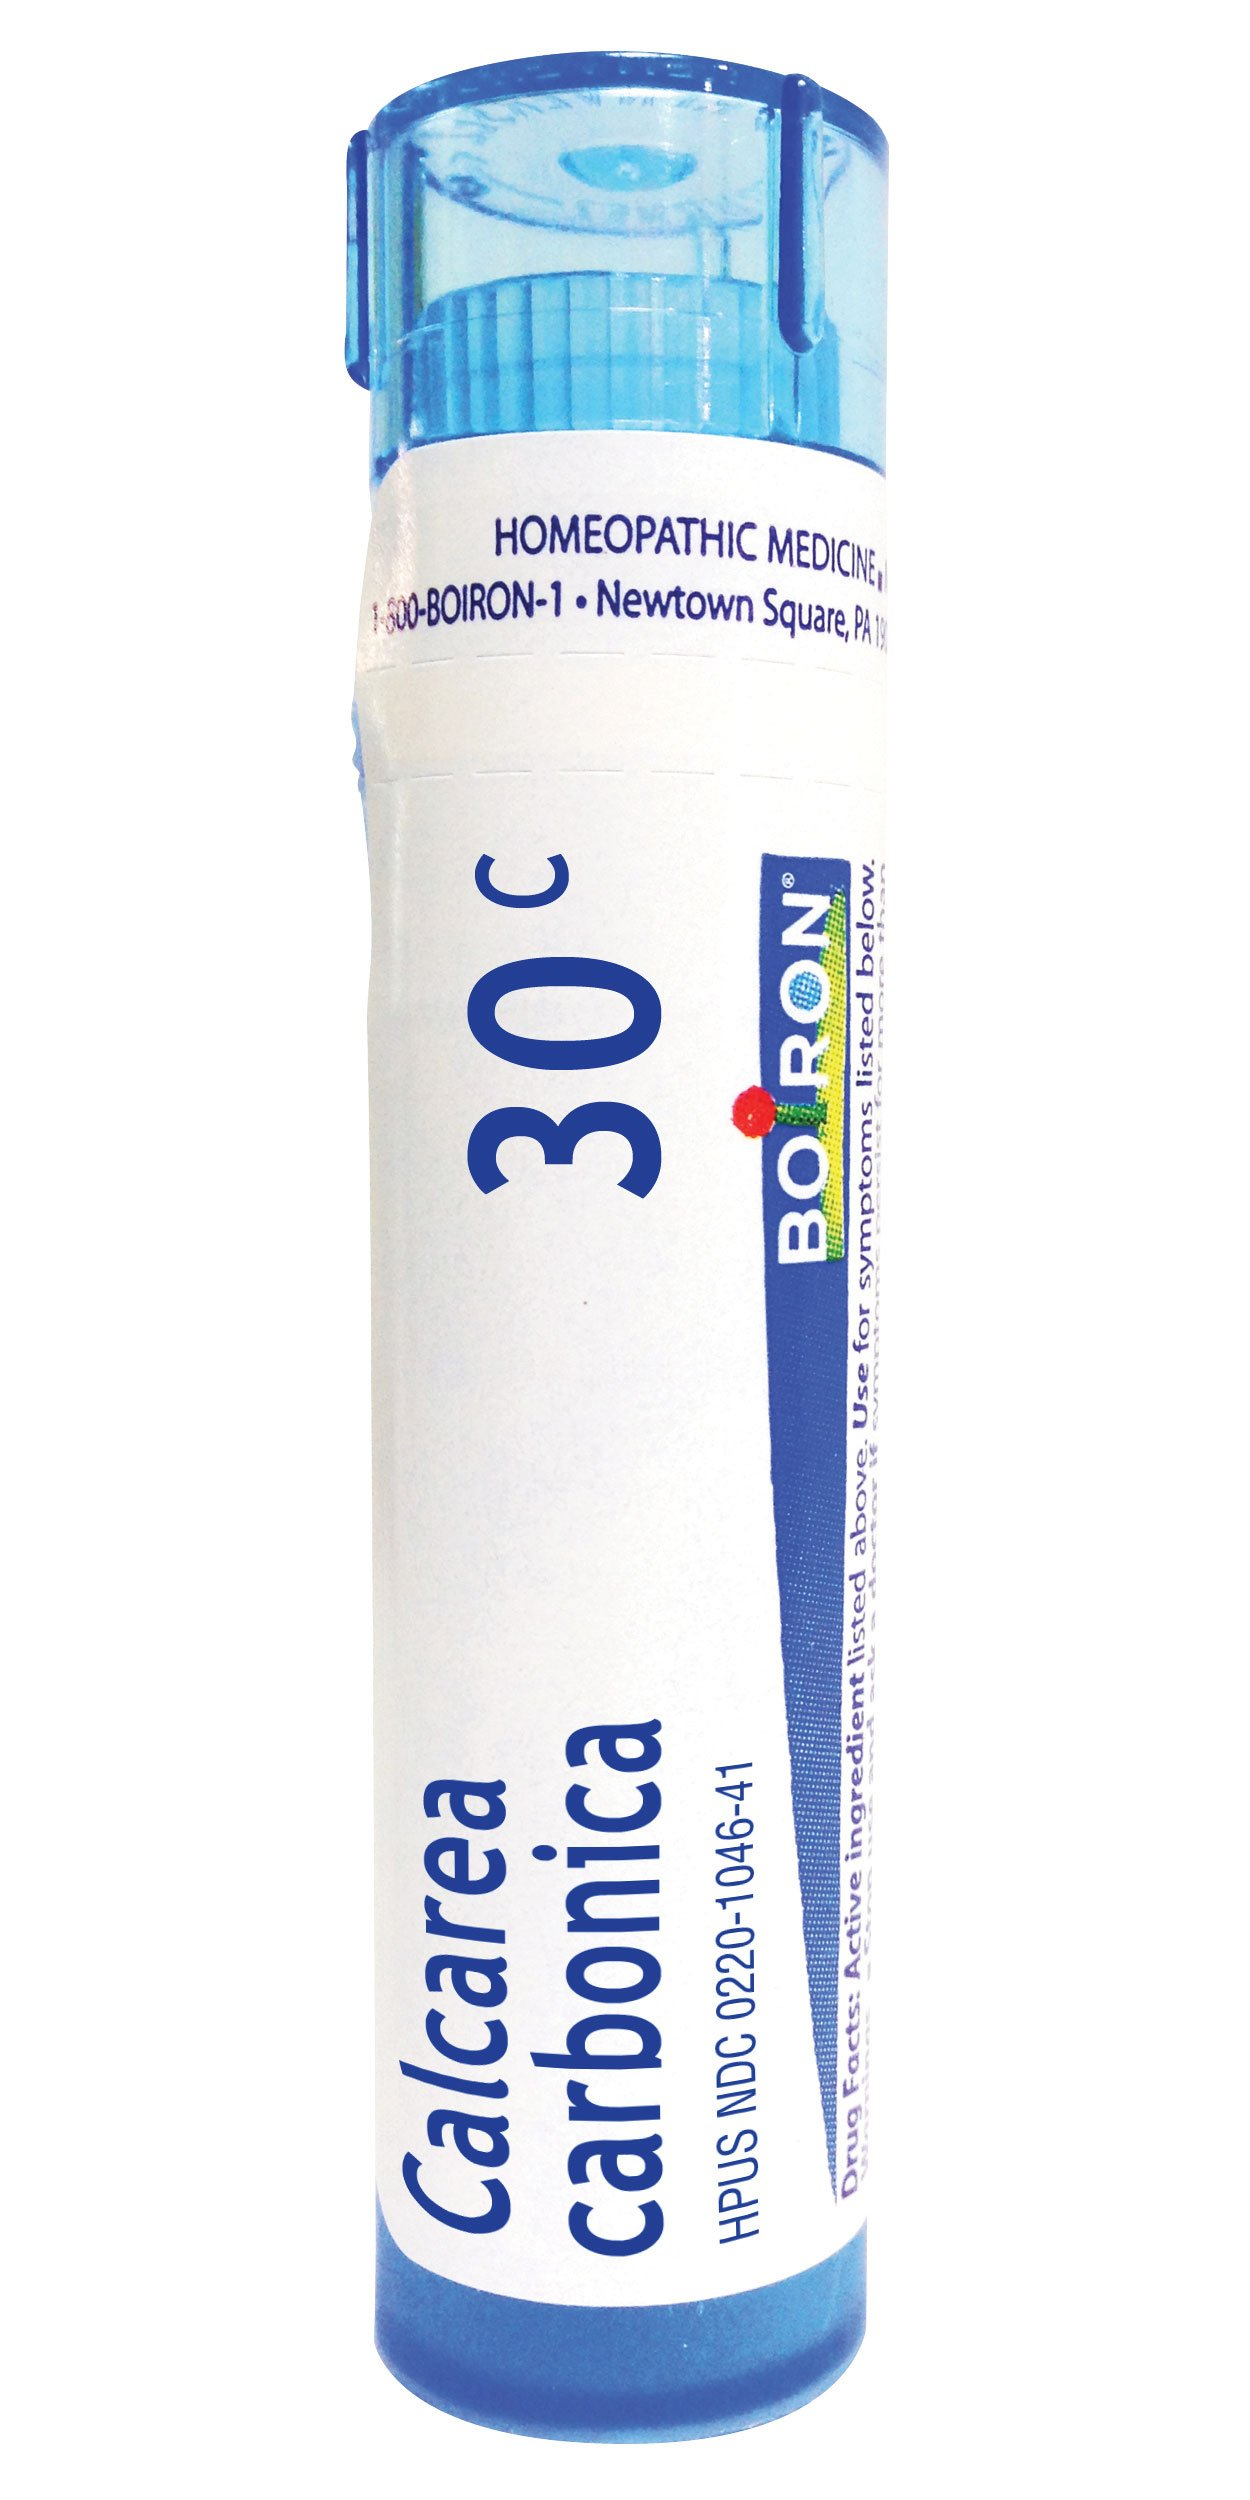 Boiron Calcarea Carbonica 30C, 80 Pellets, Homeopathic Medicine for Cradle Cap